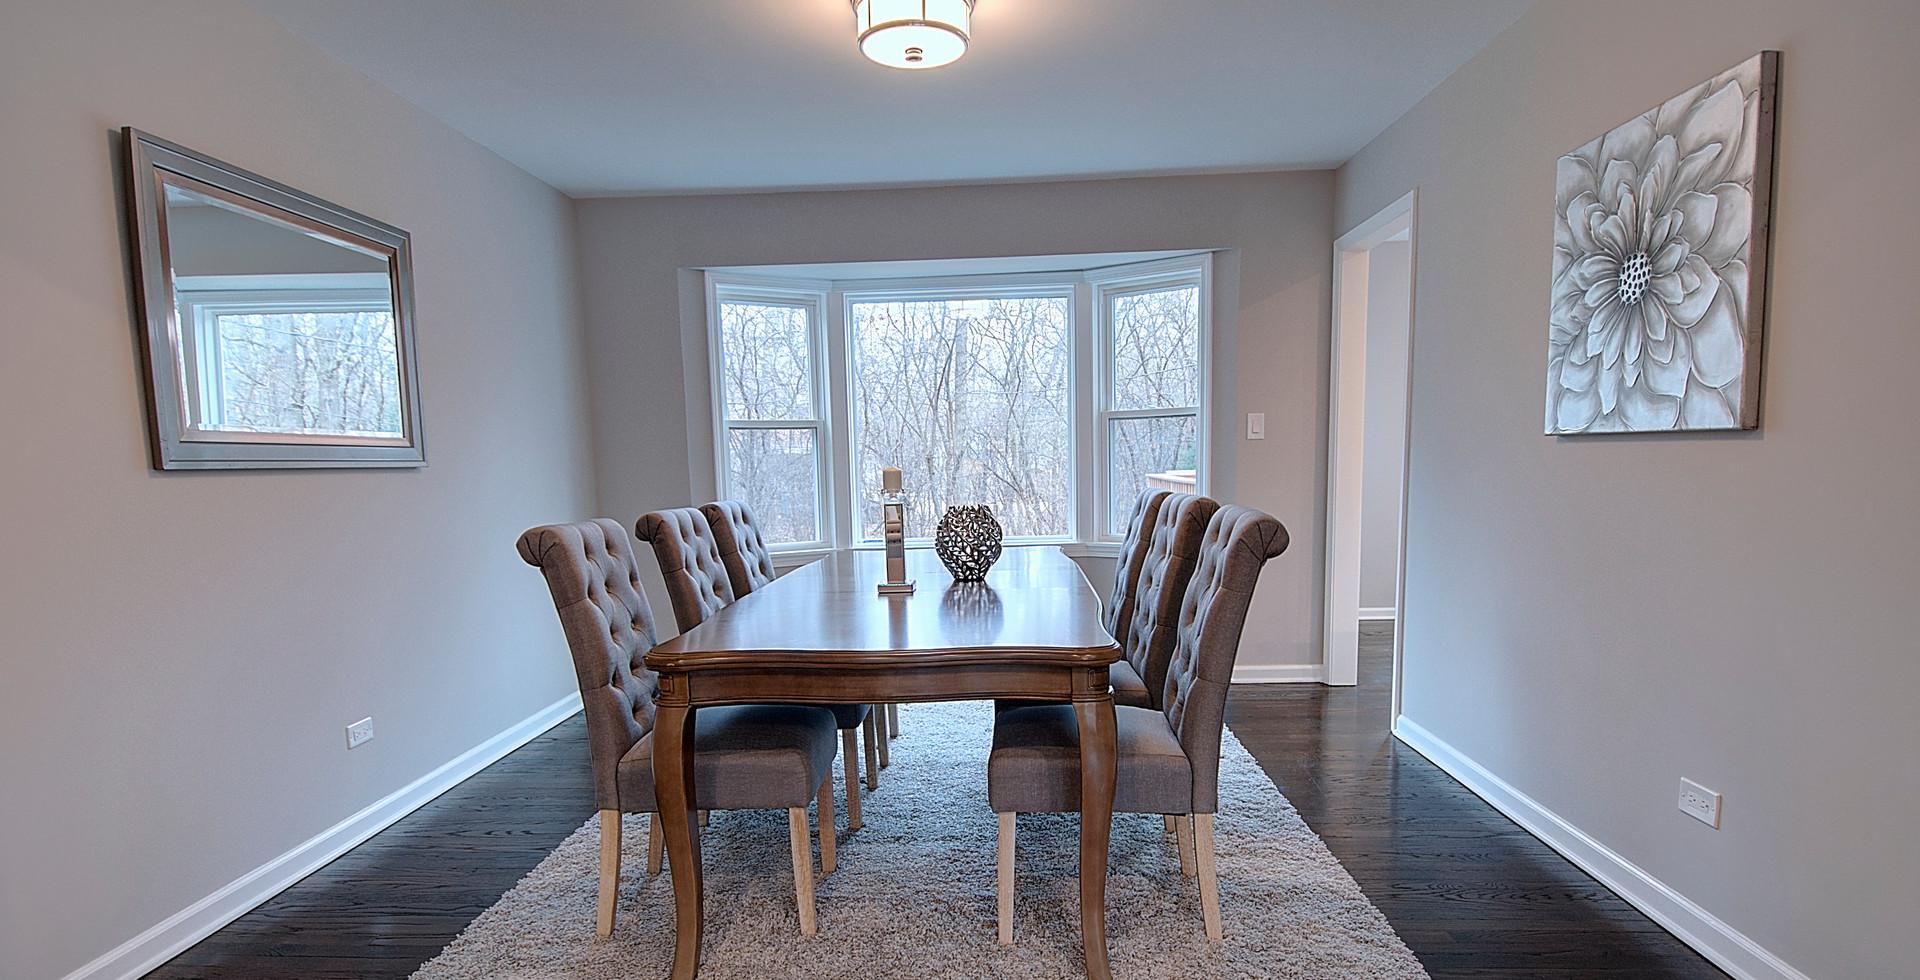 Dining Room in Winnetka designed by MRM Home Design.jpg